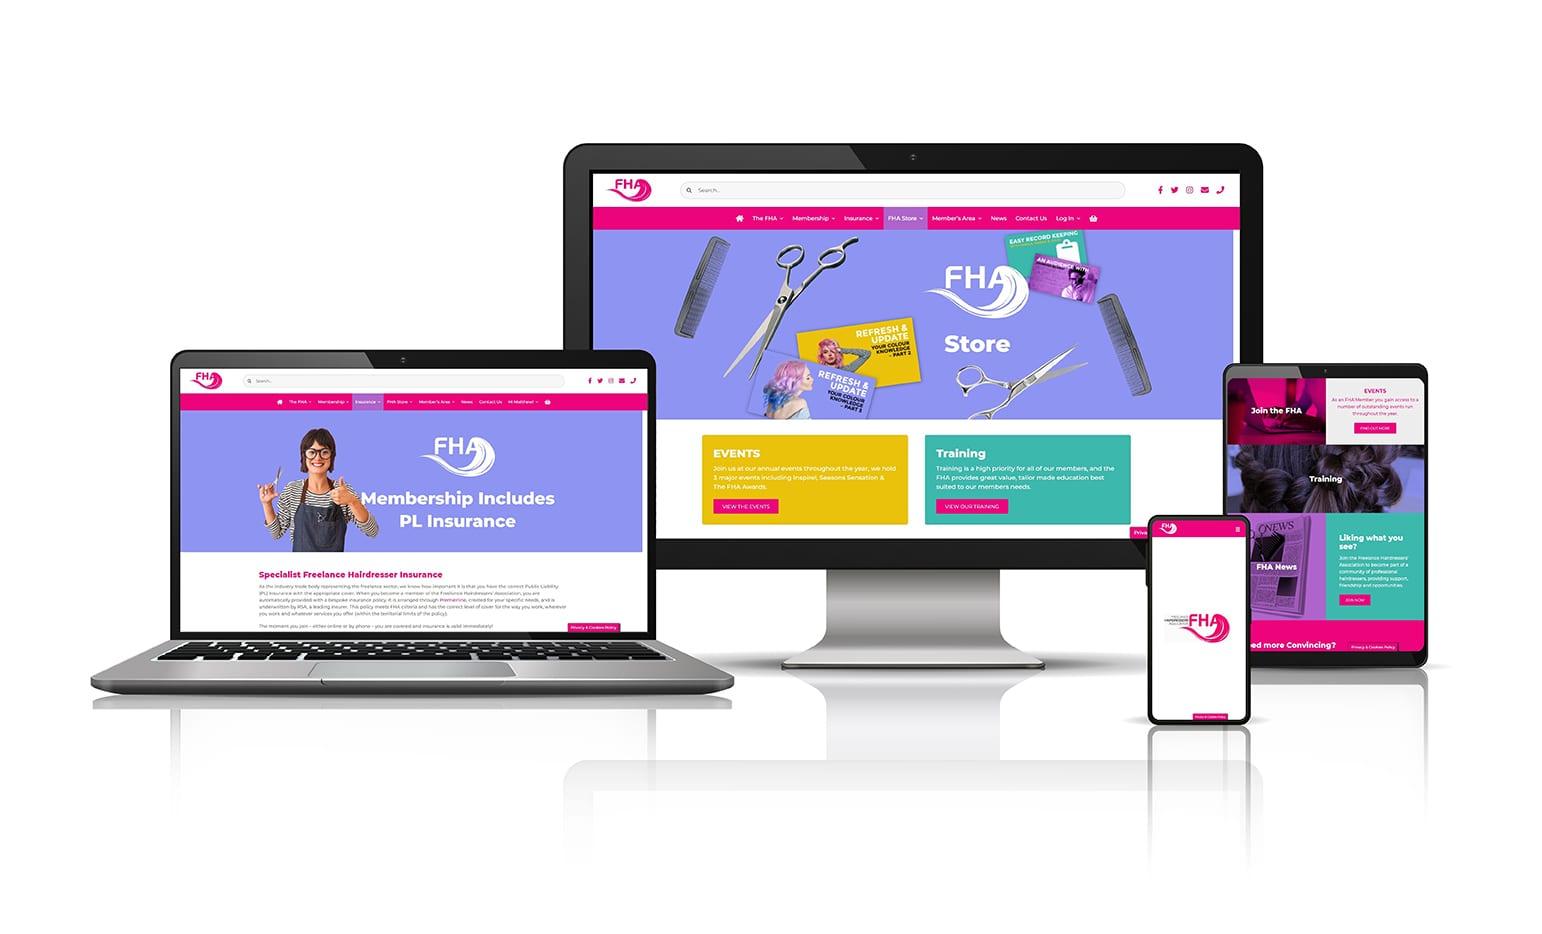 Freelance Hairdresser's Association's website